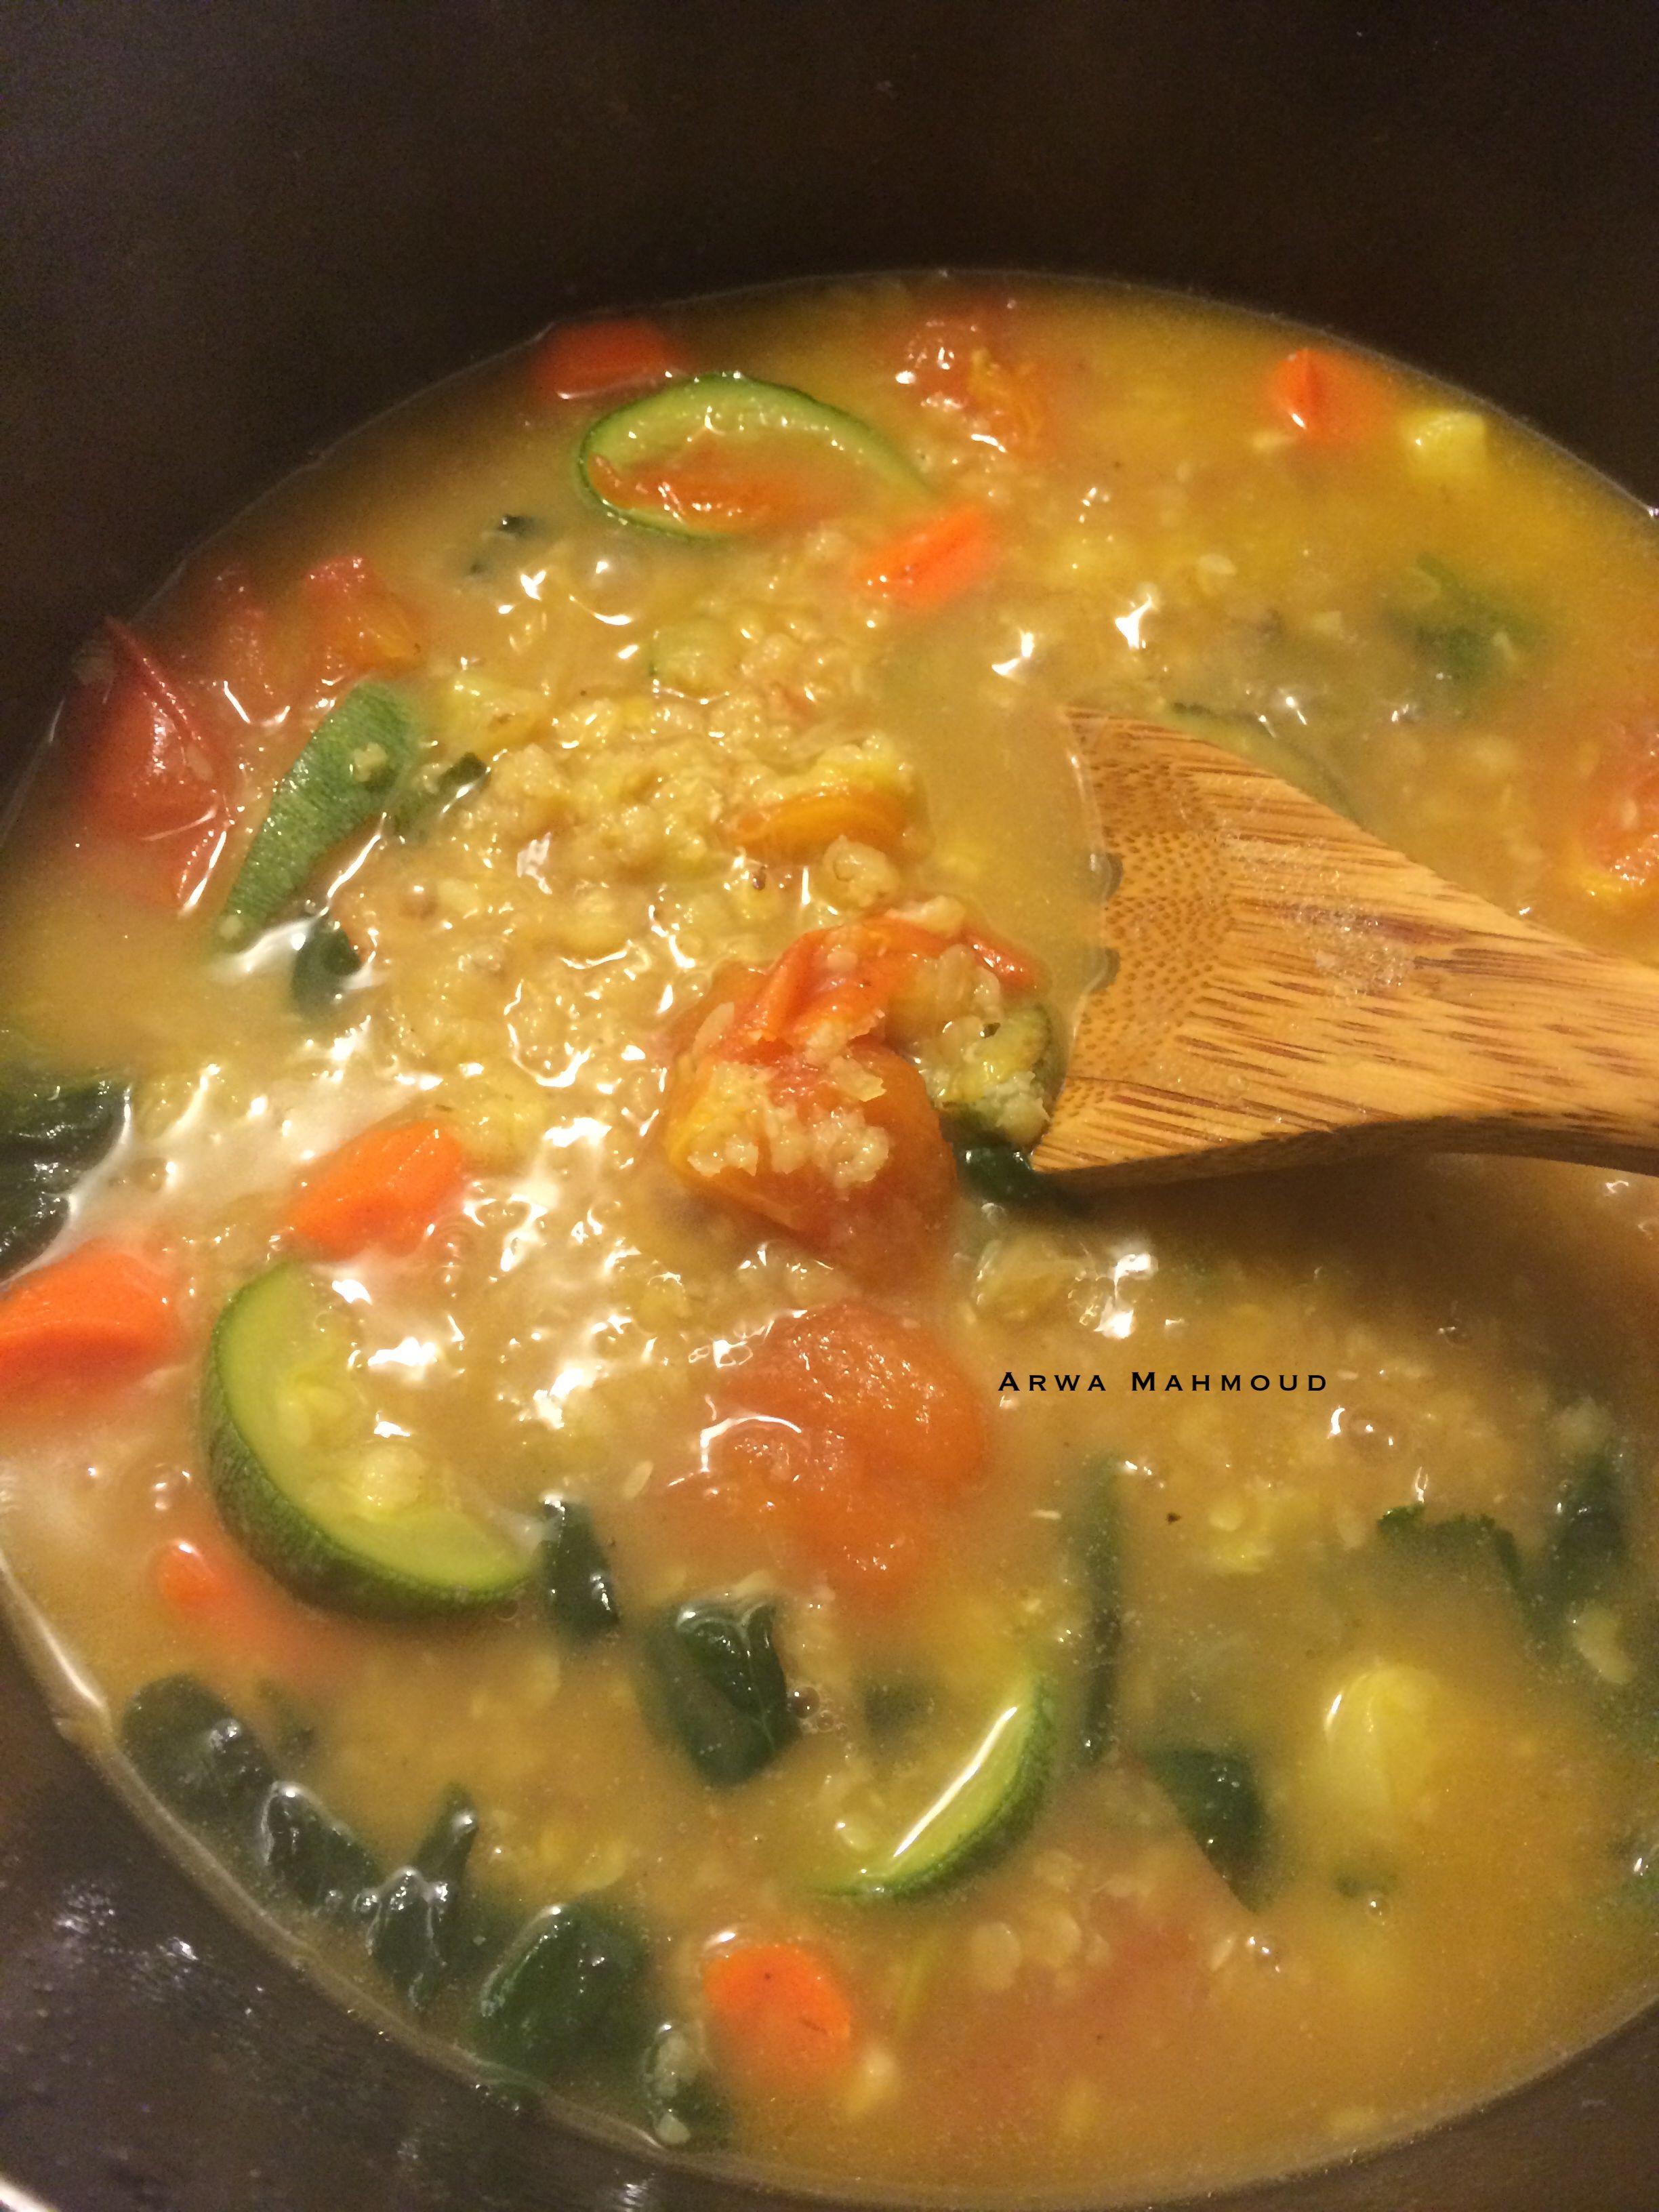 شوربة العدس مع الخضار بصل سبانخ كوسا جزر طماطم Lentil Soup With Veggies Onion Spinach Zucchini Carr Food Videos Desserts Tasty Dishes Food Videos